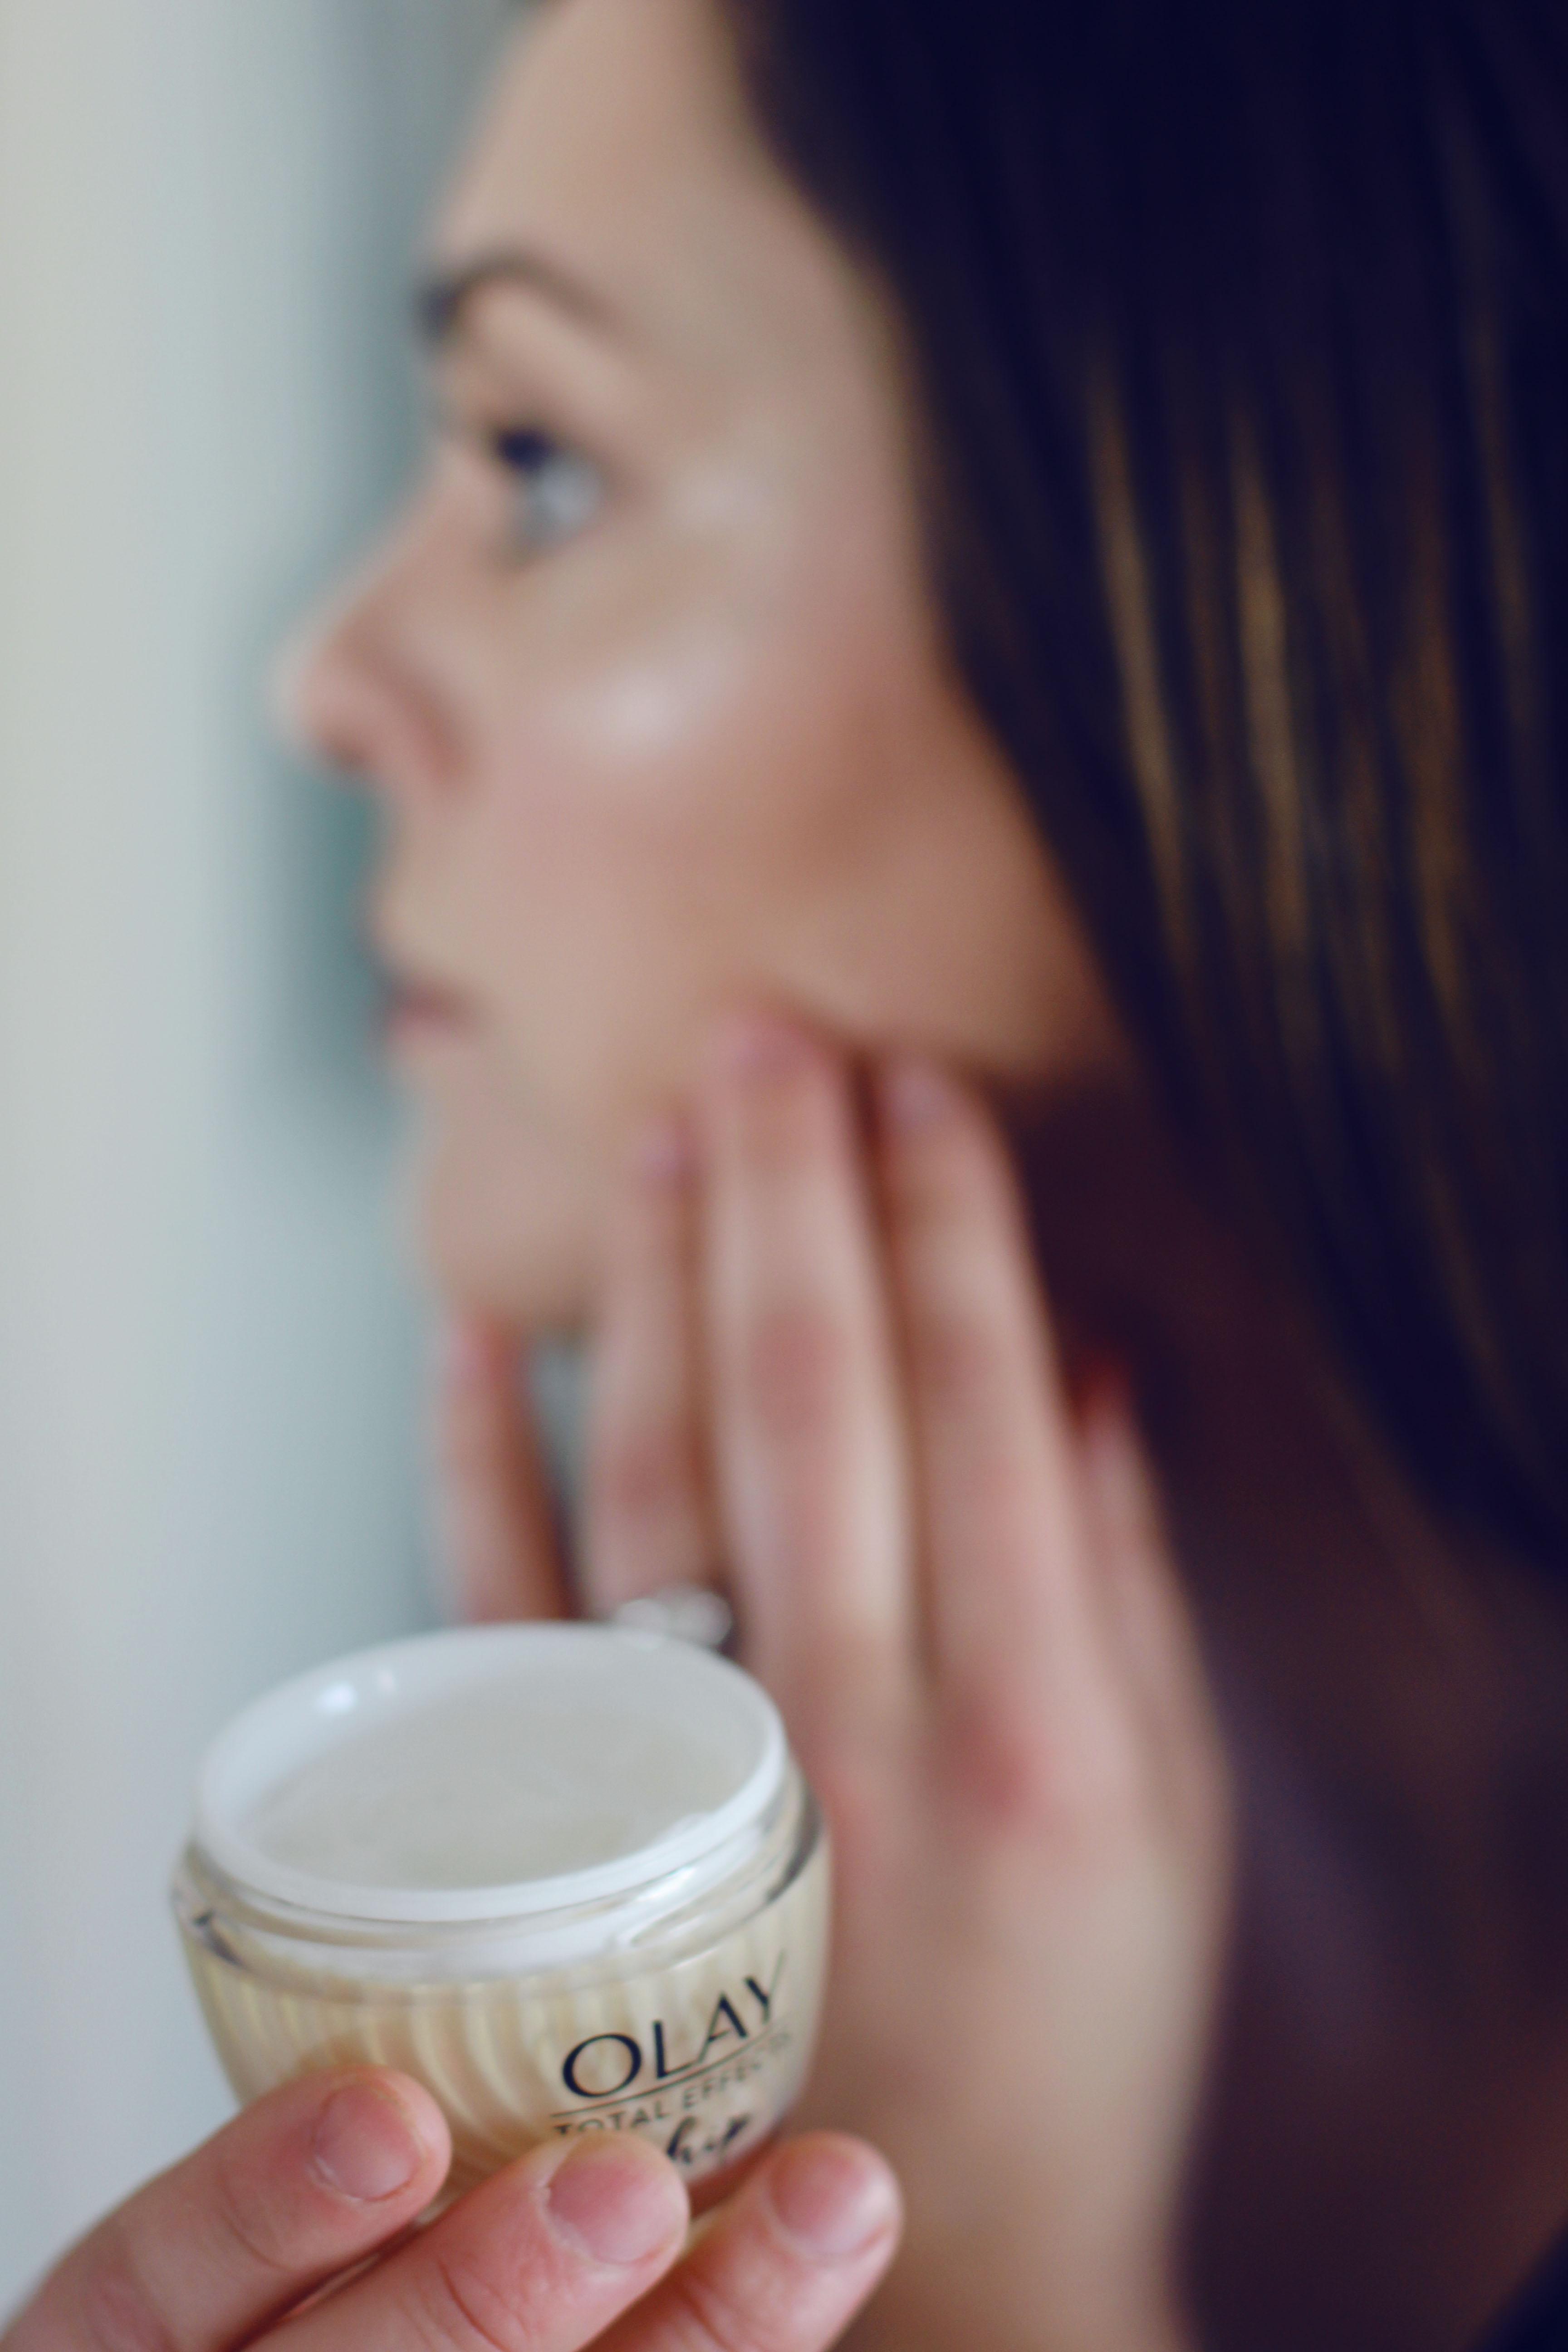 Affordable Primer & Moisturizer in One for 30+ Skin